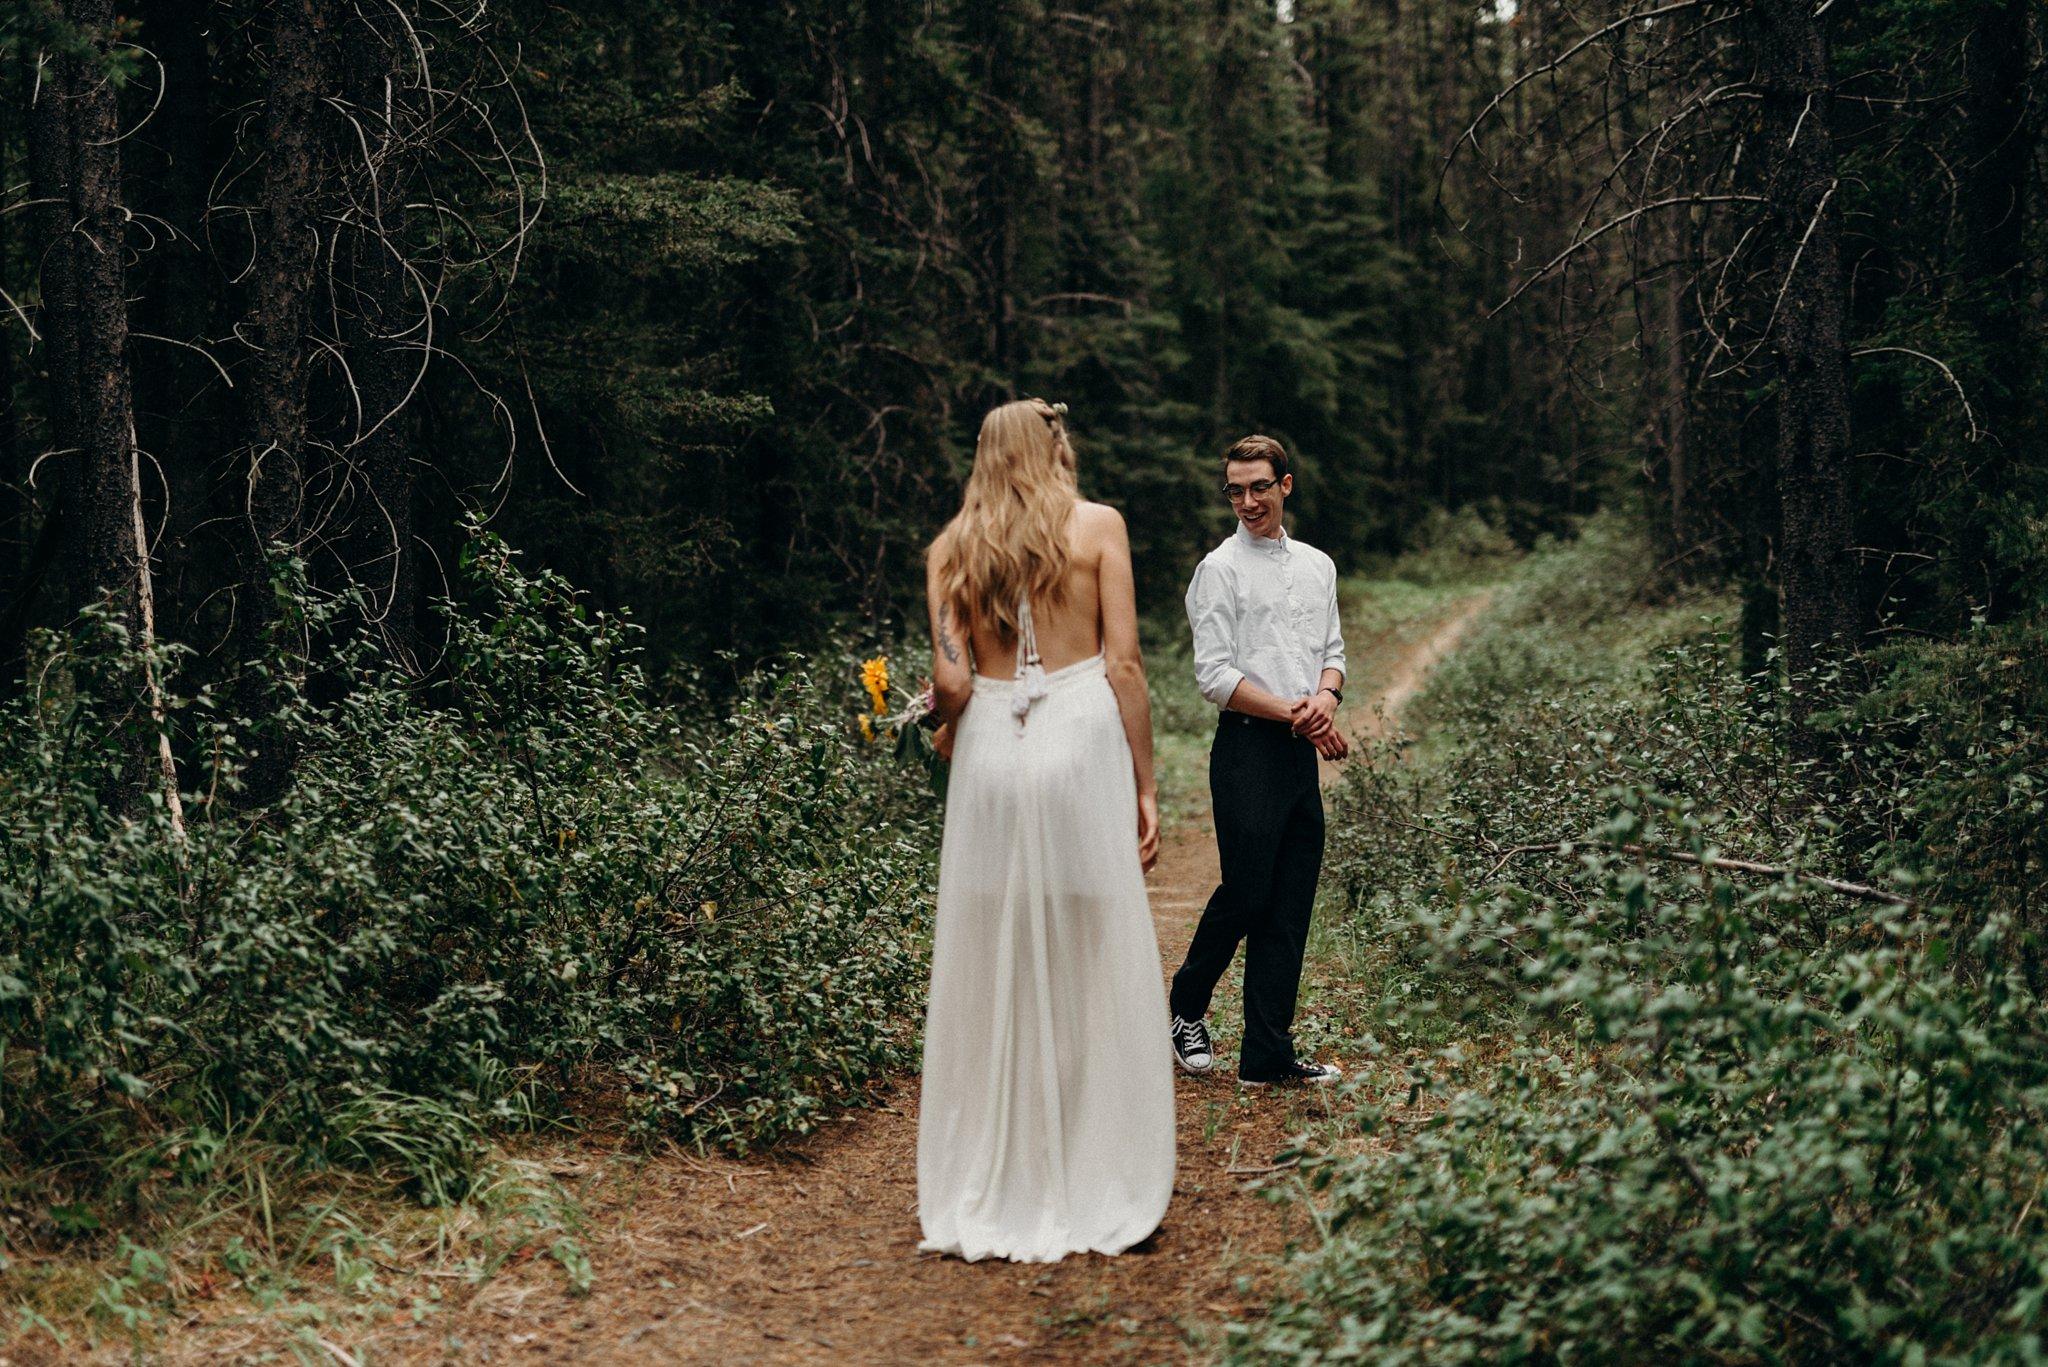 kaihla_tonai_intimate_wedding_elopement_photographer_6362.jpg